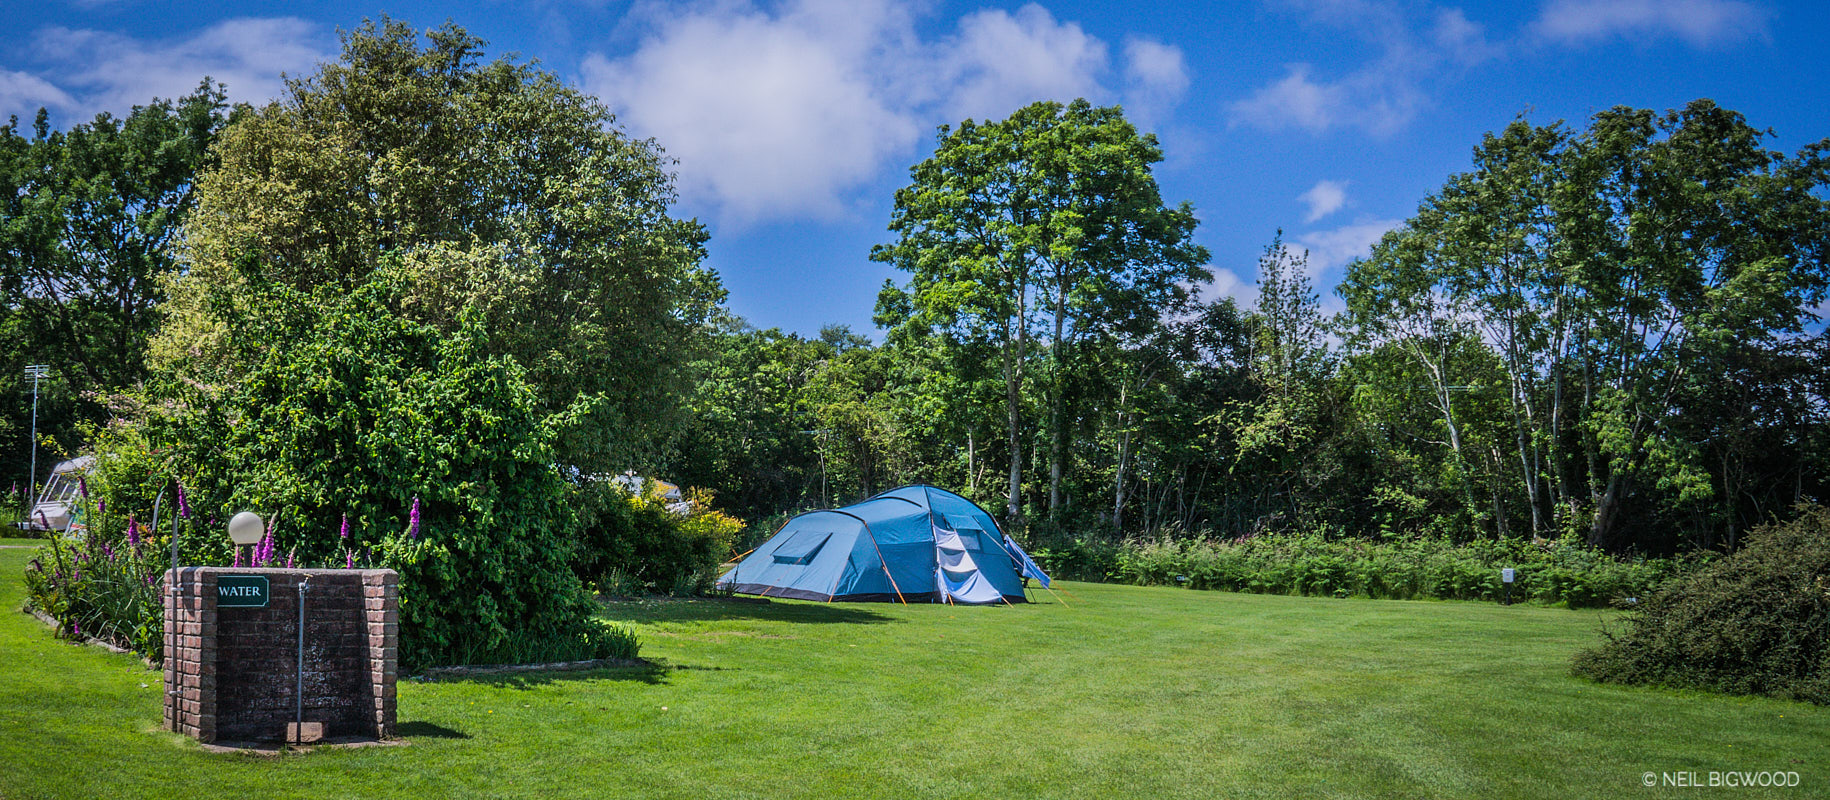 Neil-Bigwood-Monkton-Wyld-Camping-87